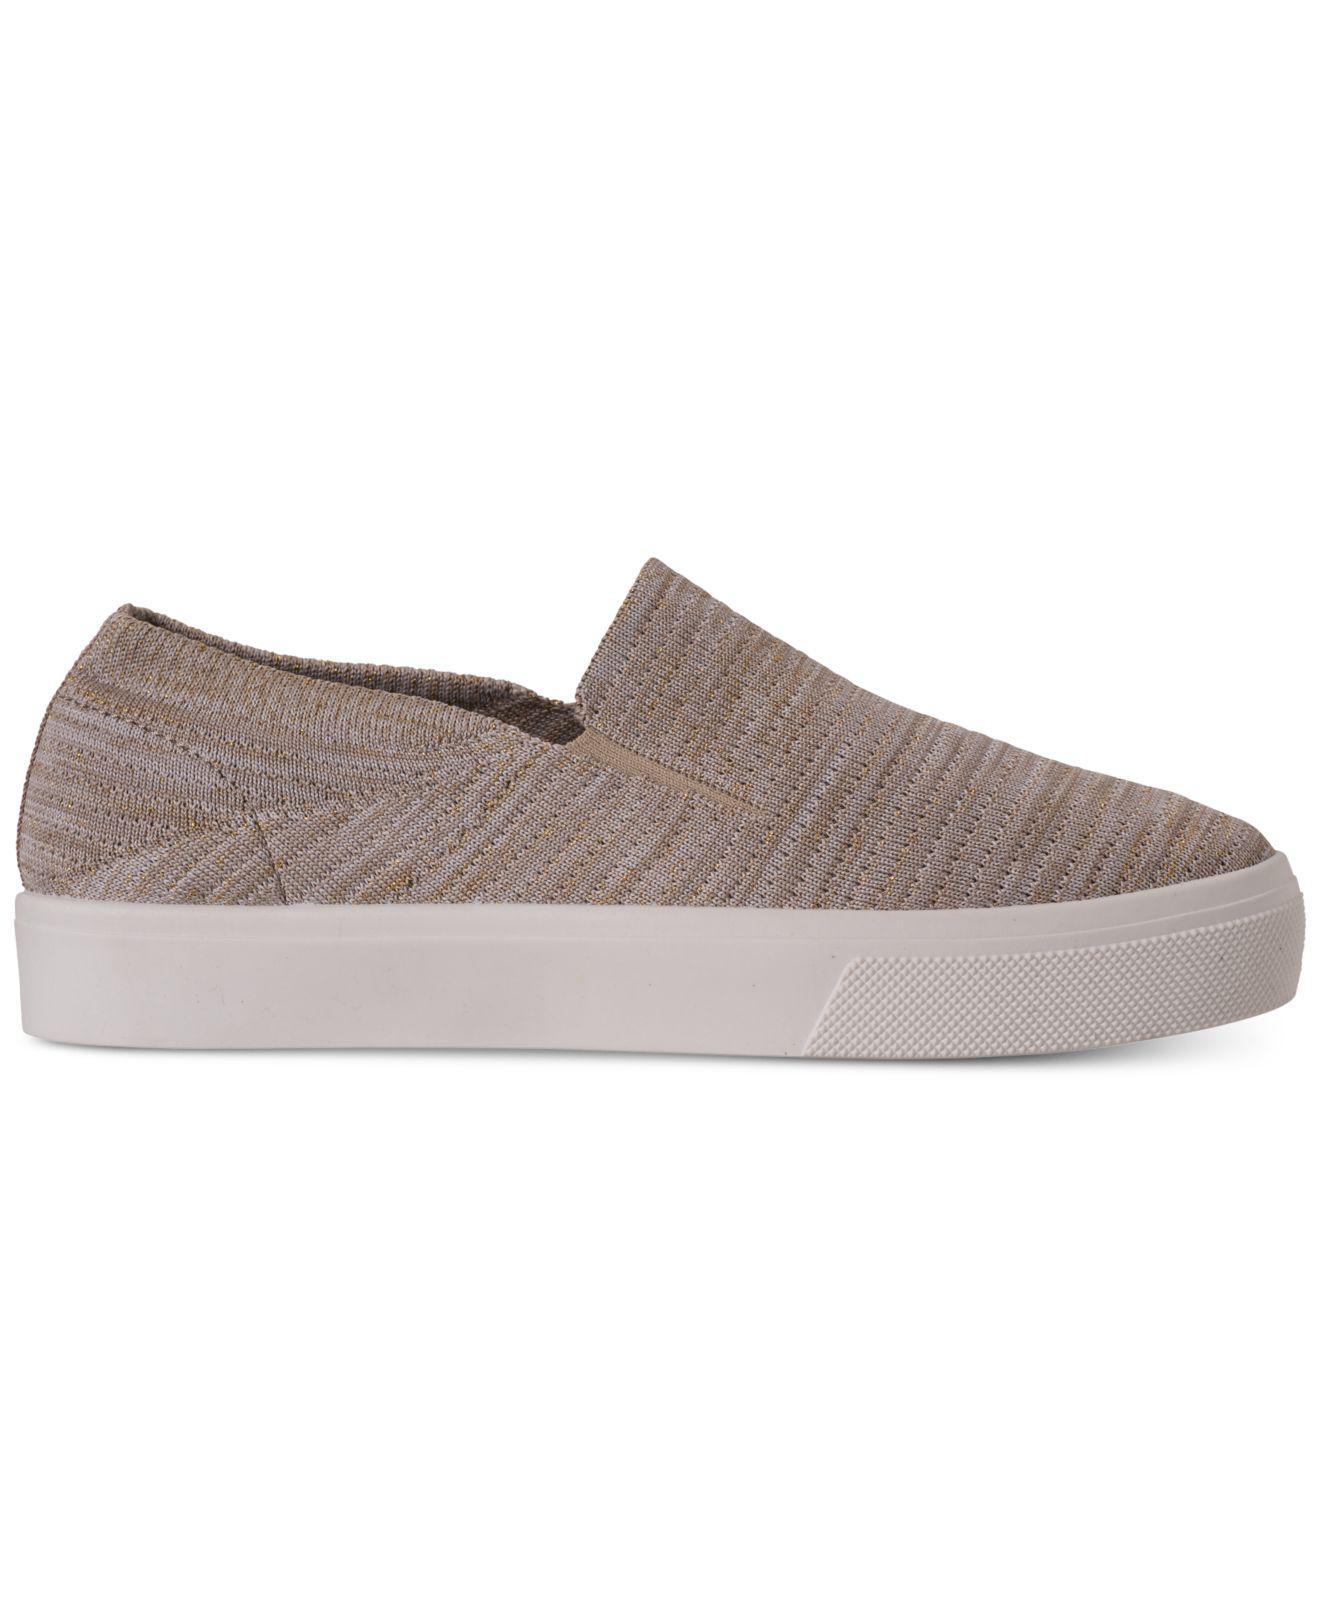 89c3279b923f Lyst - Skechers Street Poppy Blurred Lines Slip-on Casual Sneakers ...